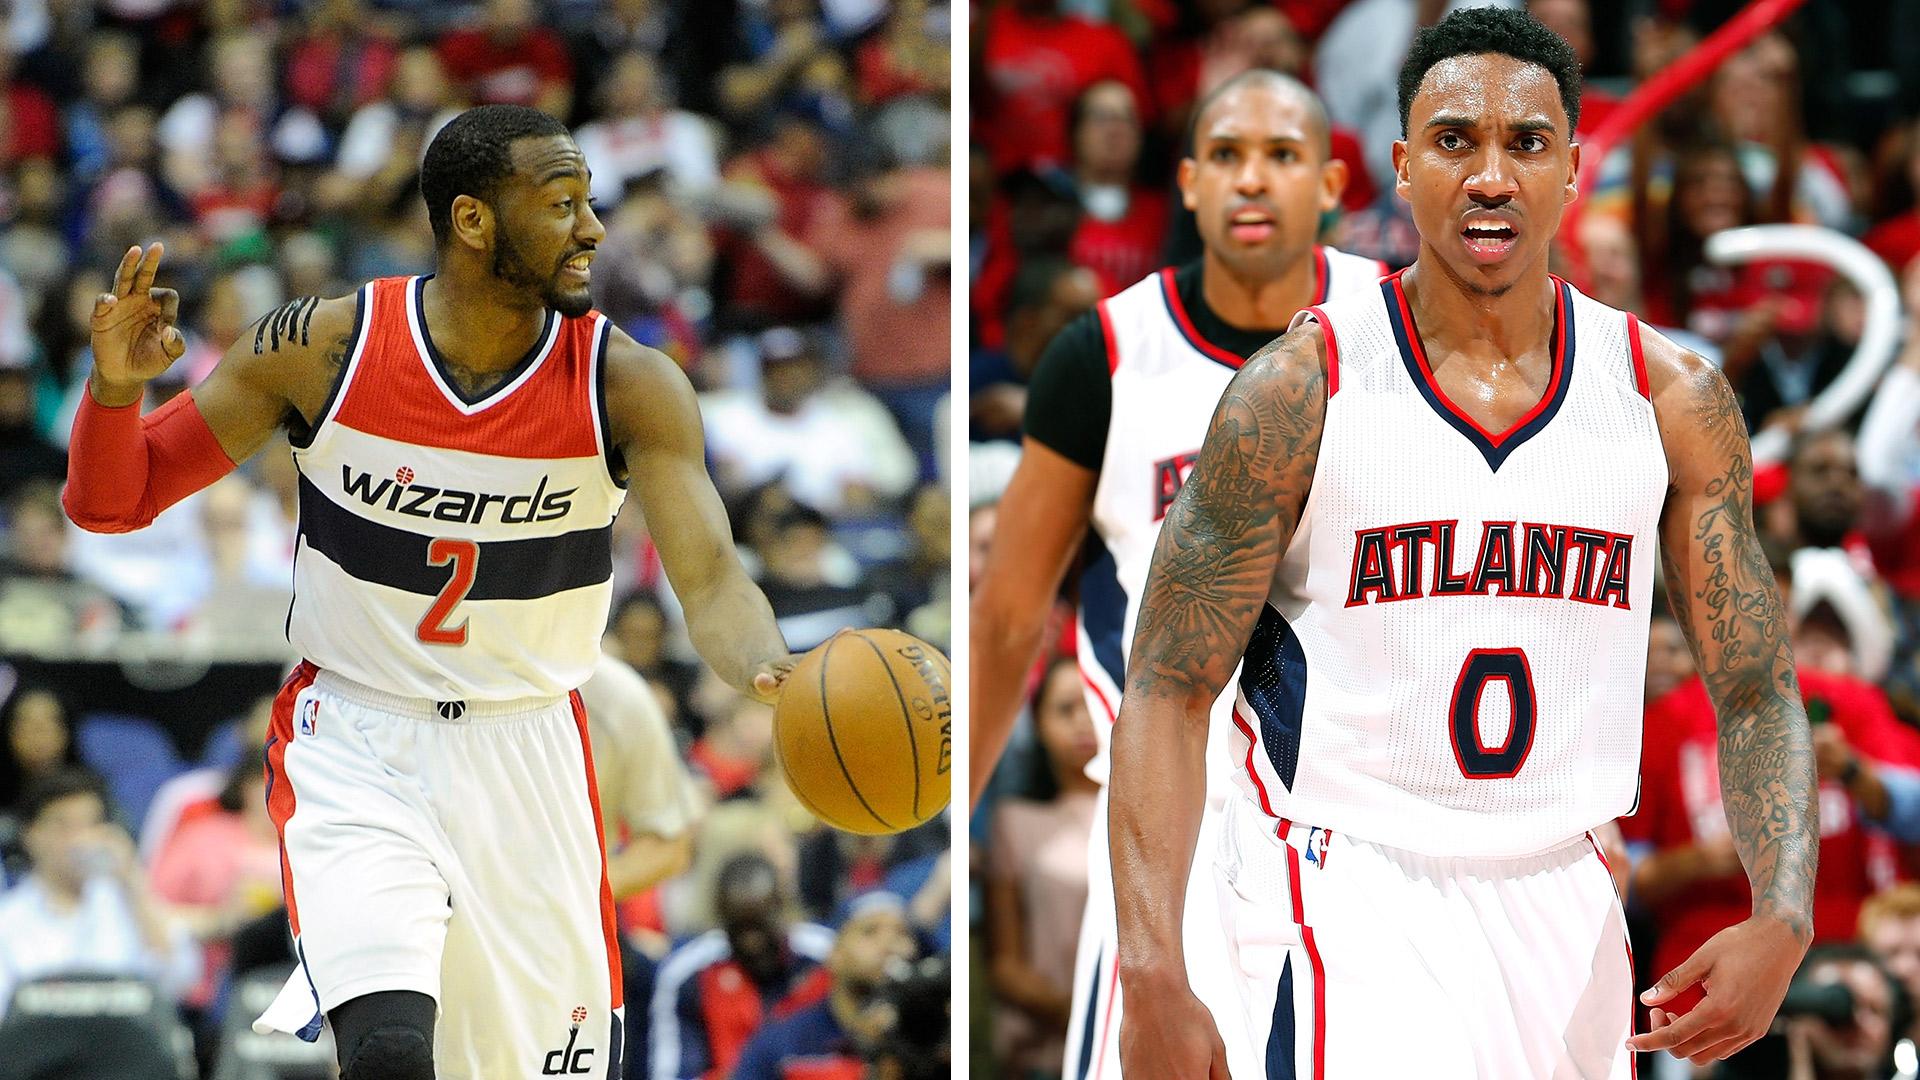 Must-see NBA playoffs second-round photos